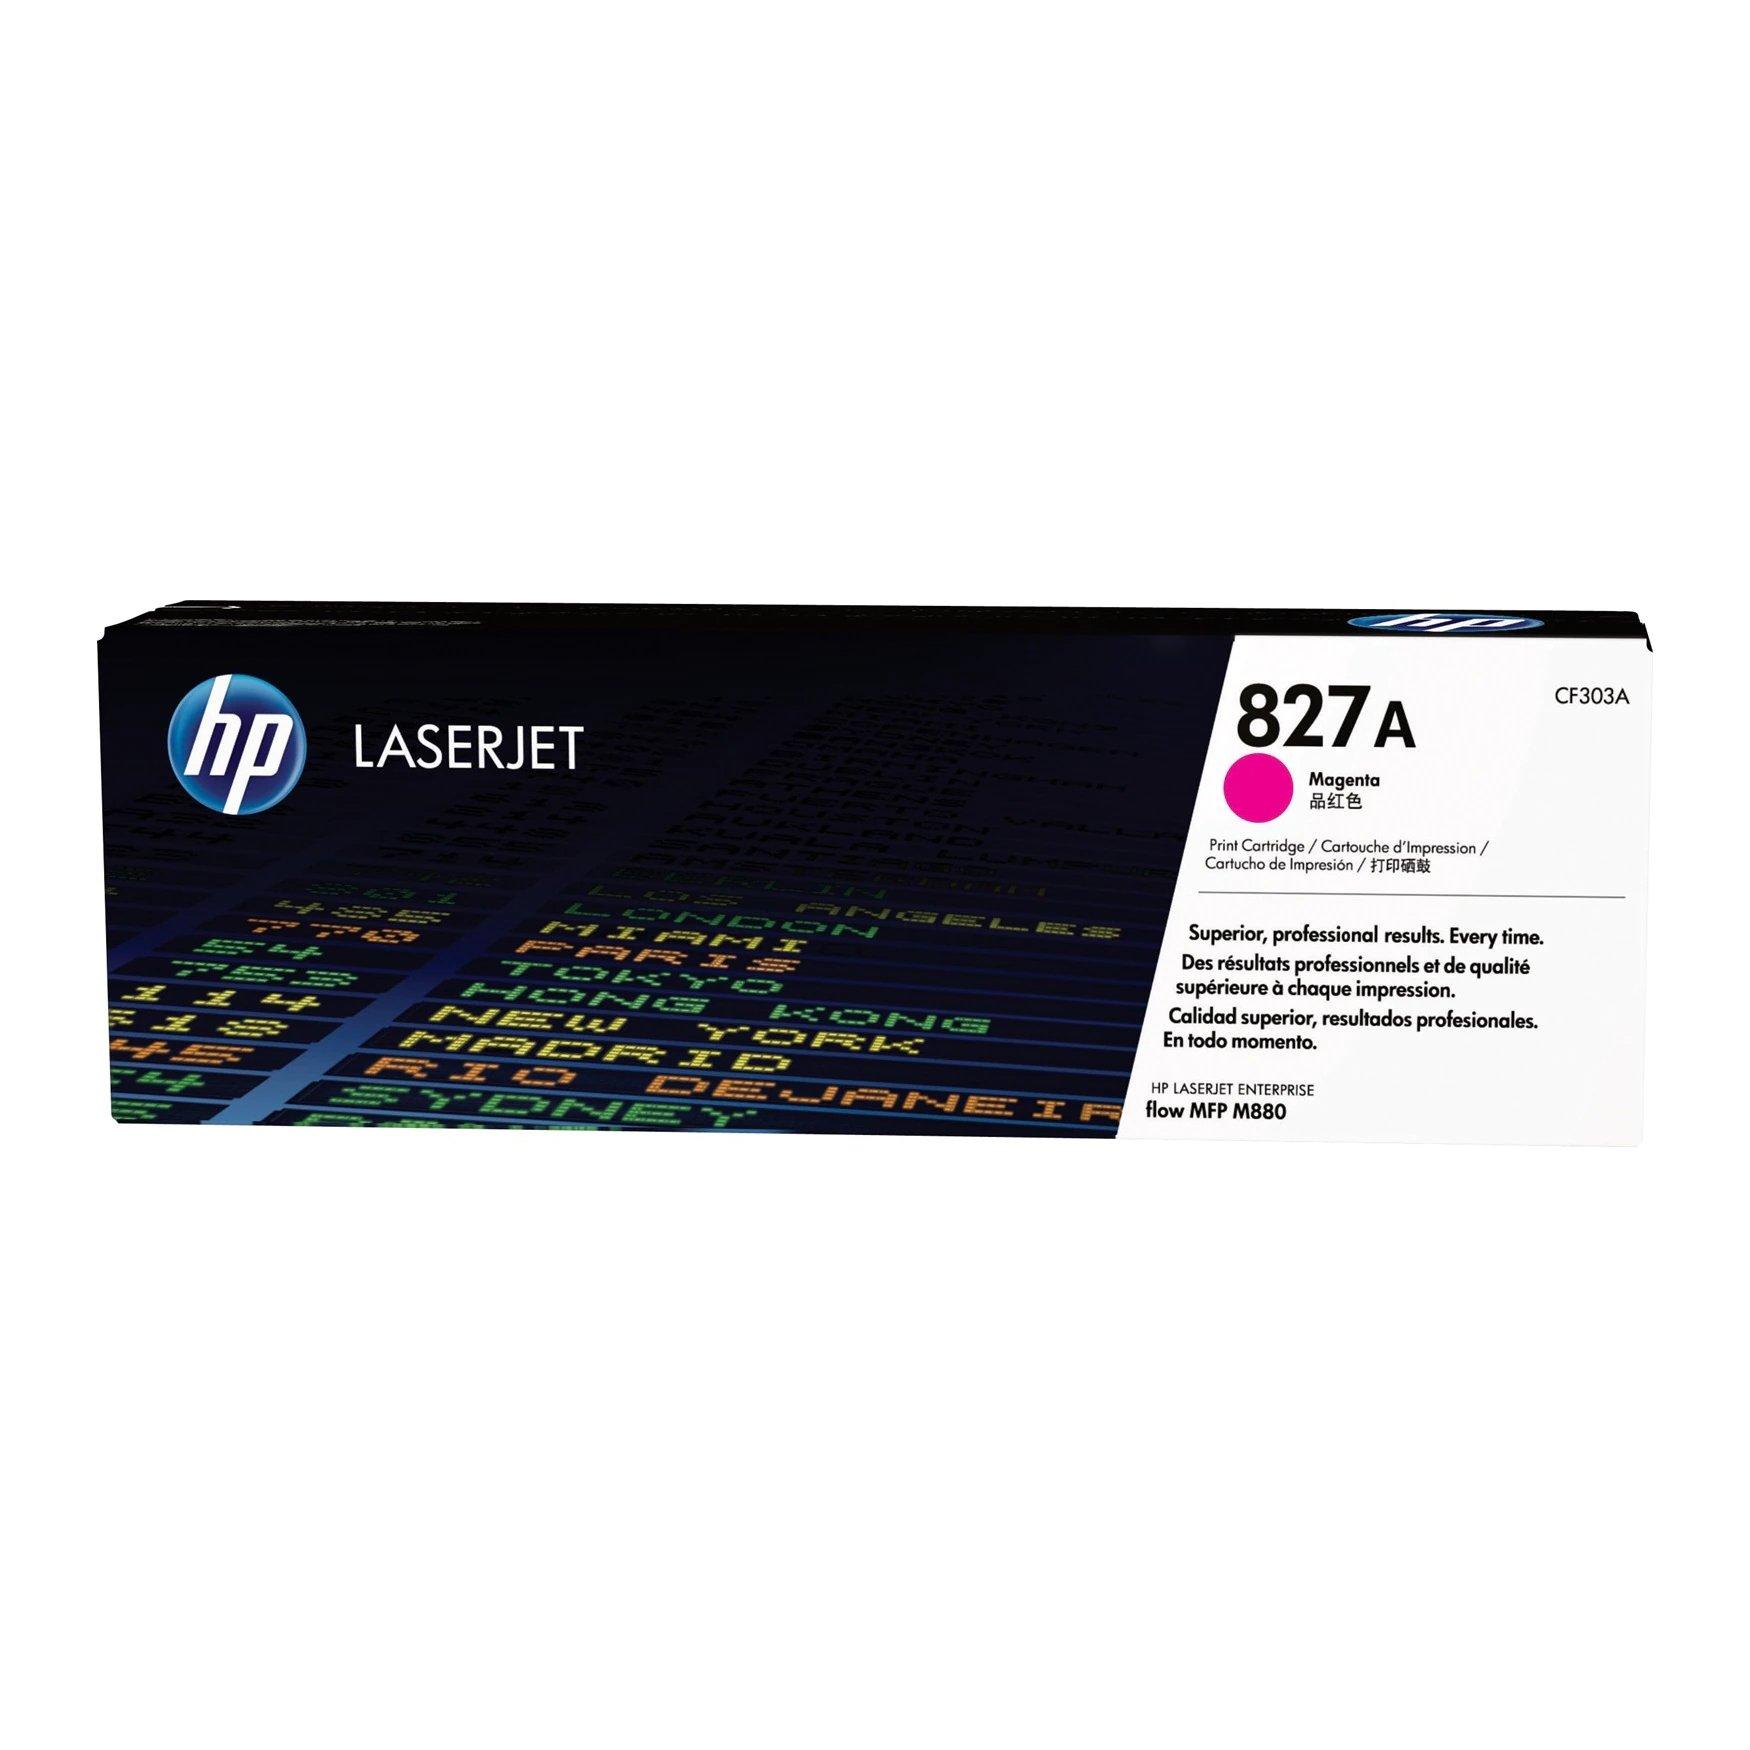 Hewlett Packard [HP] 827A LaserJet Toner Cartridge Page Life 32000pp Magenta Ref CF303A